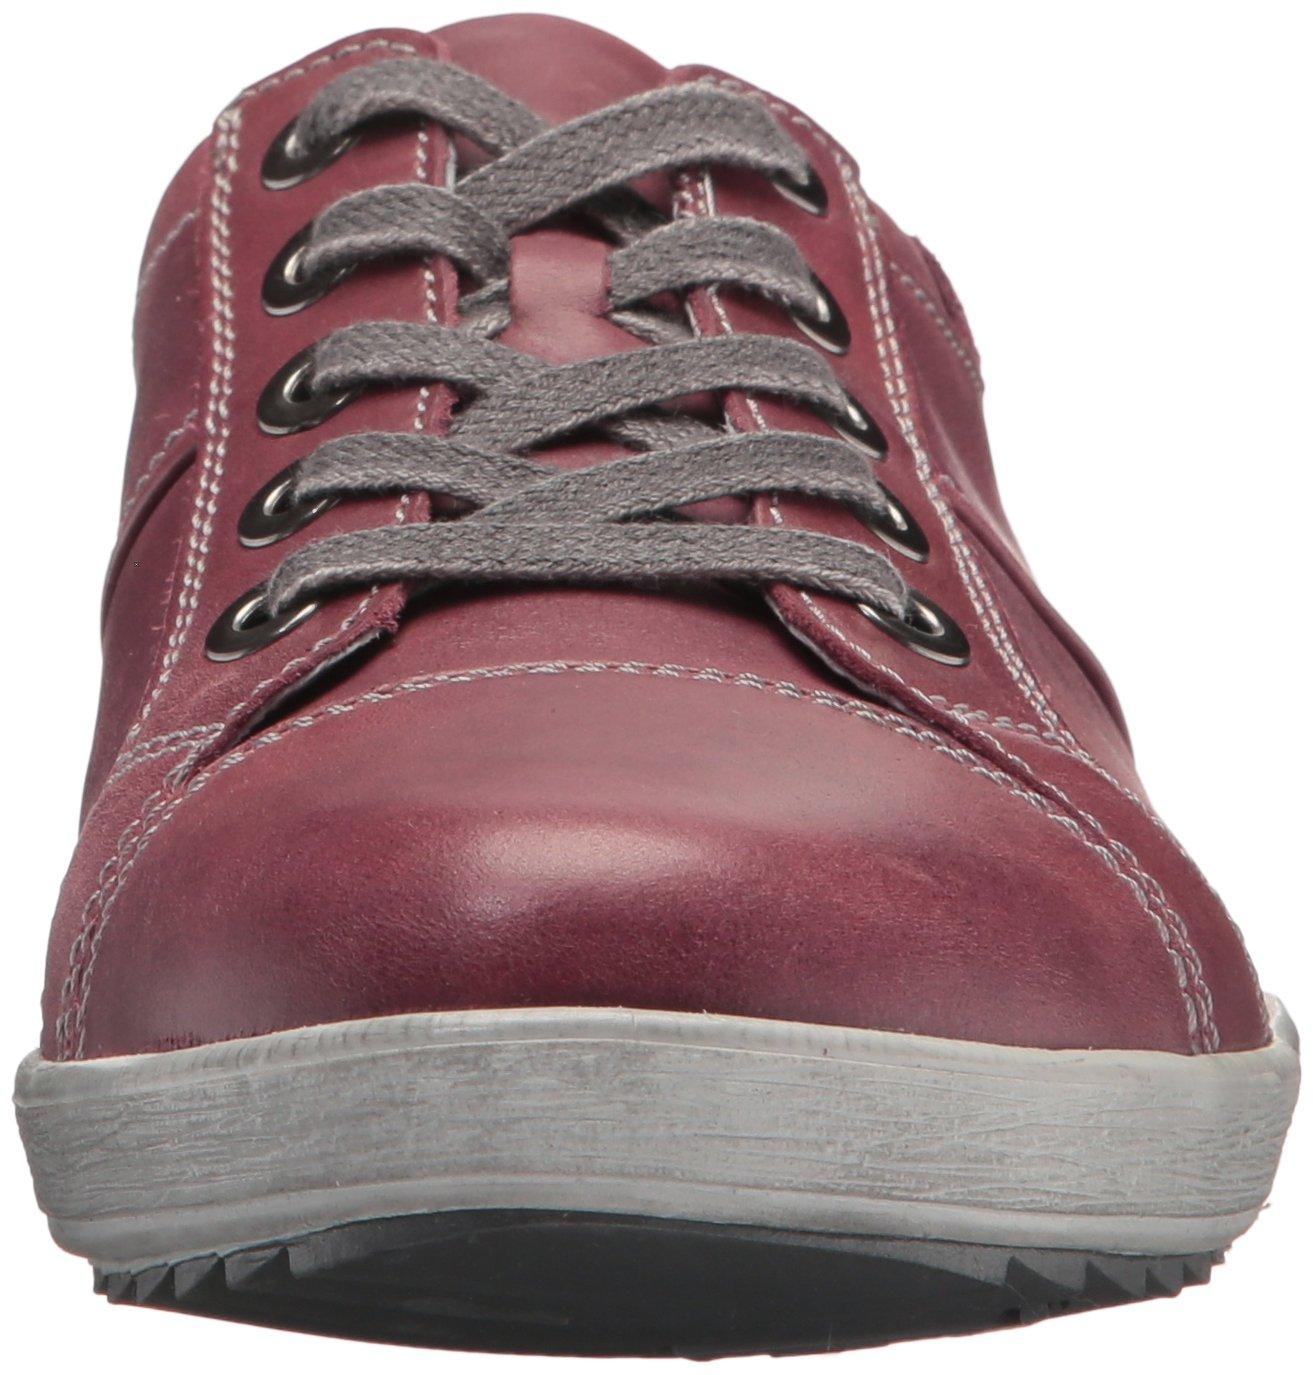 Josef Seibel Women's B06XTB97K9 Dany 59 Fashion Sneaker B06XTB97K9 Women's 40 EU/9-9.5 M US|Bordo 5060eb